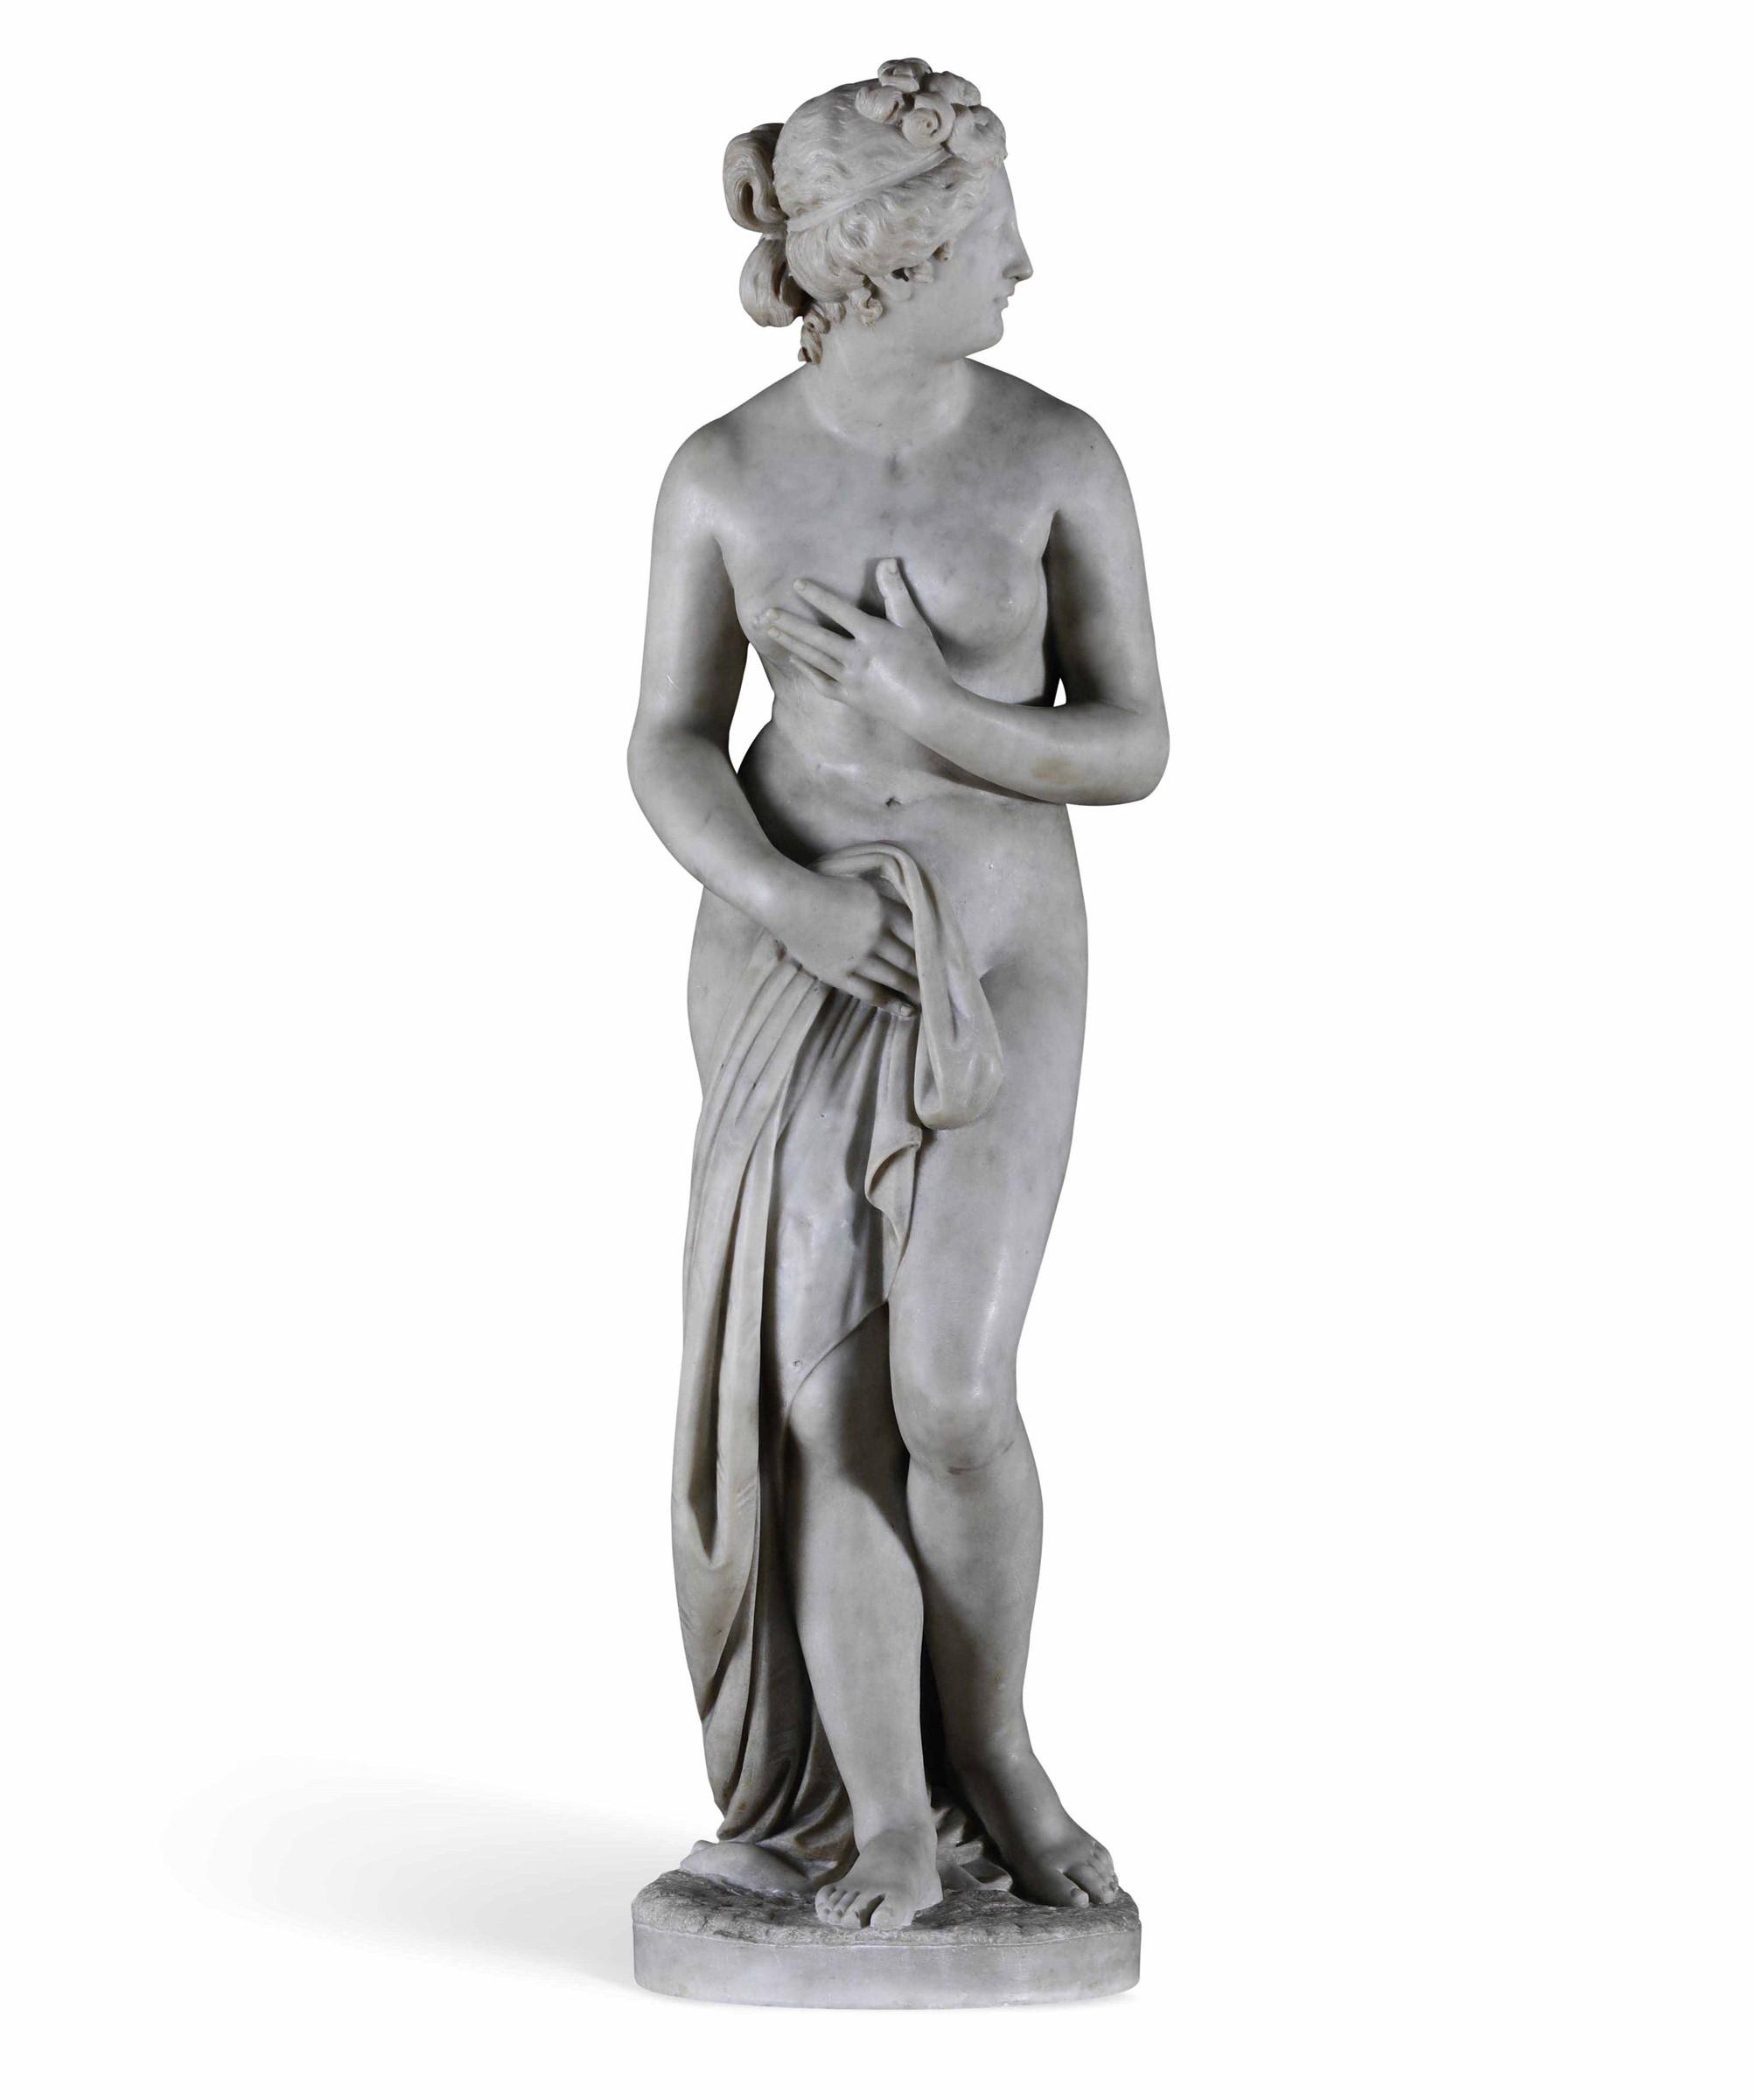 A marble Venus, model by Canova, Italy, 18-1900s - altezza statua cm 122, base cm 100 [...] - Image 2 of 3